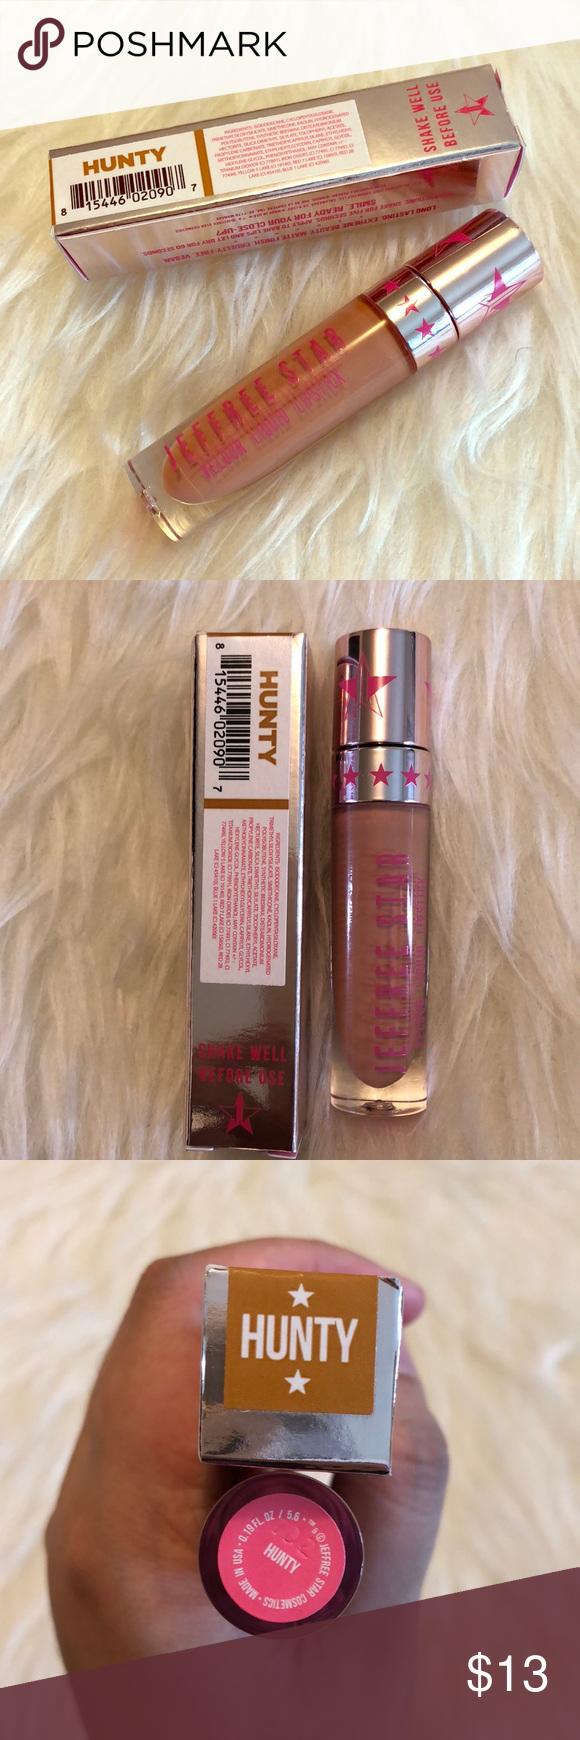 Pin by Melissa Mendoza on MAKEUP   Makeup dupes, Lipstick